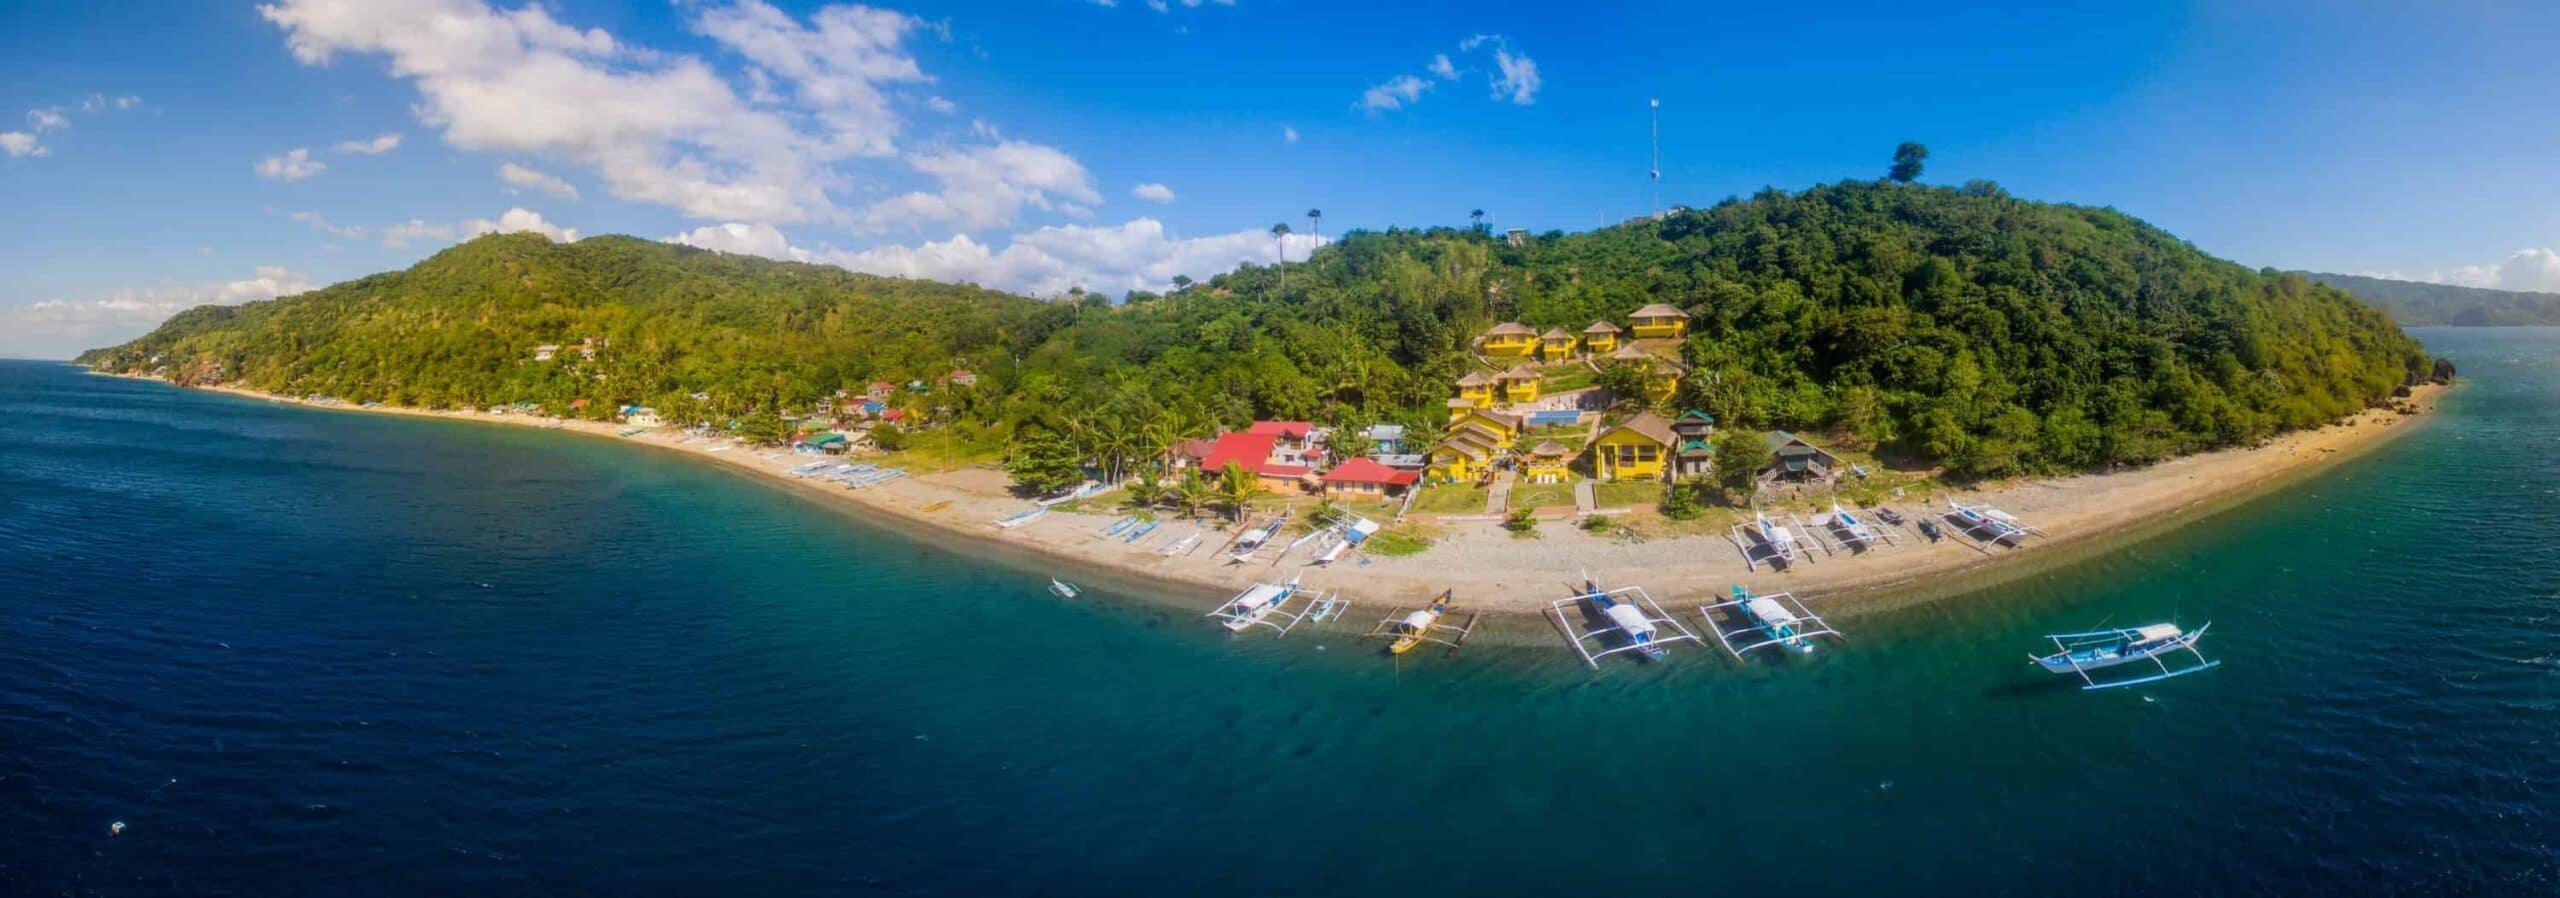 Buceo Anilao Beach and Dive Resort, Batangas